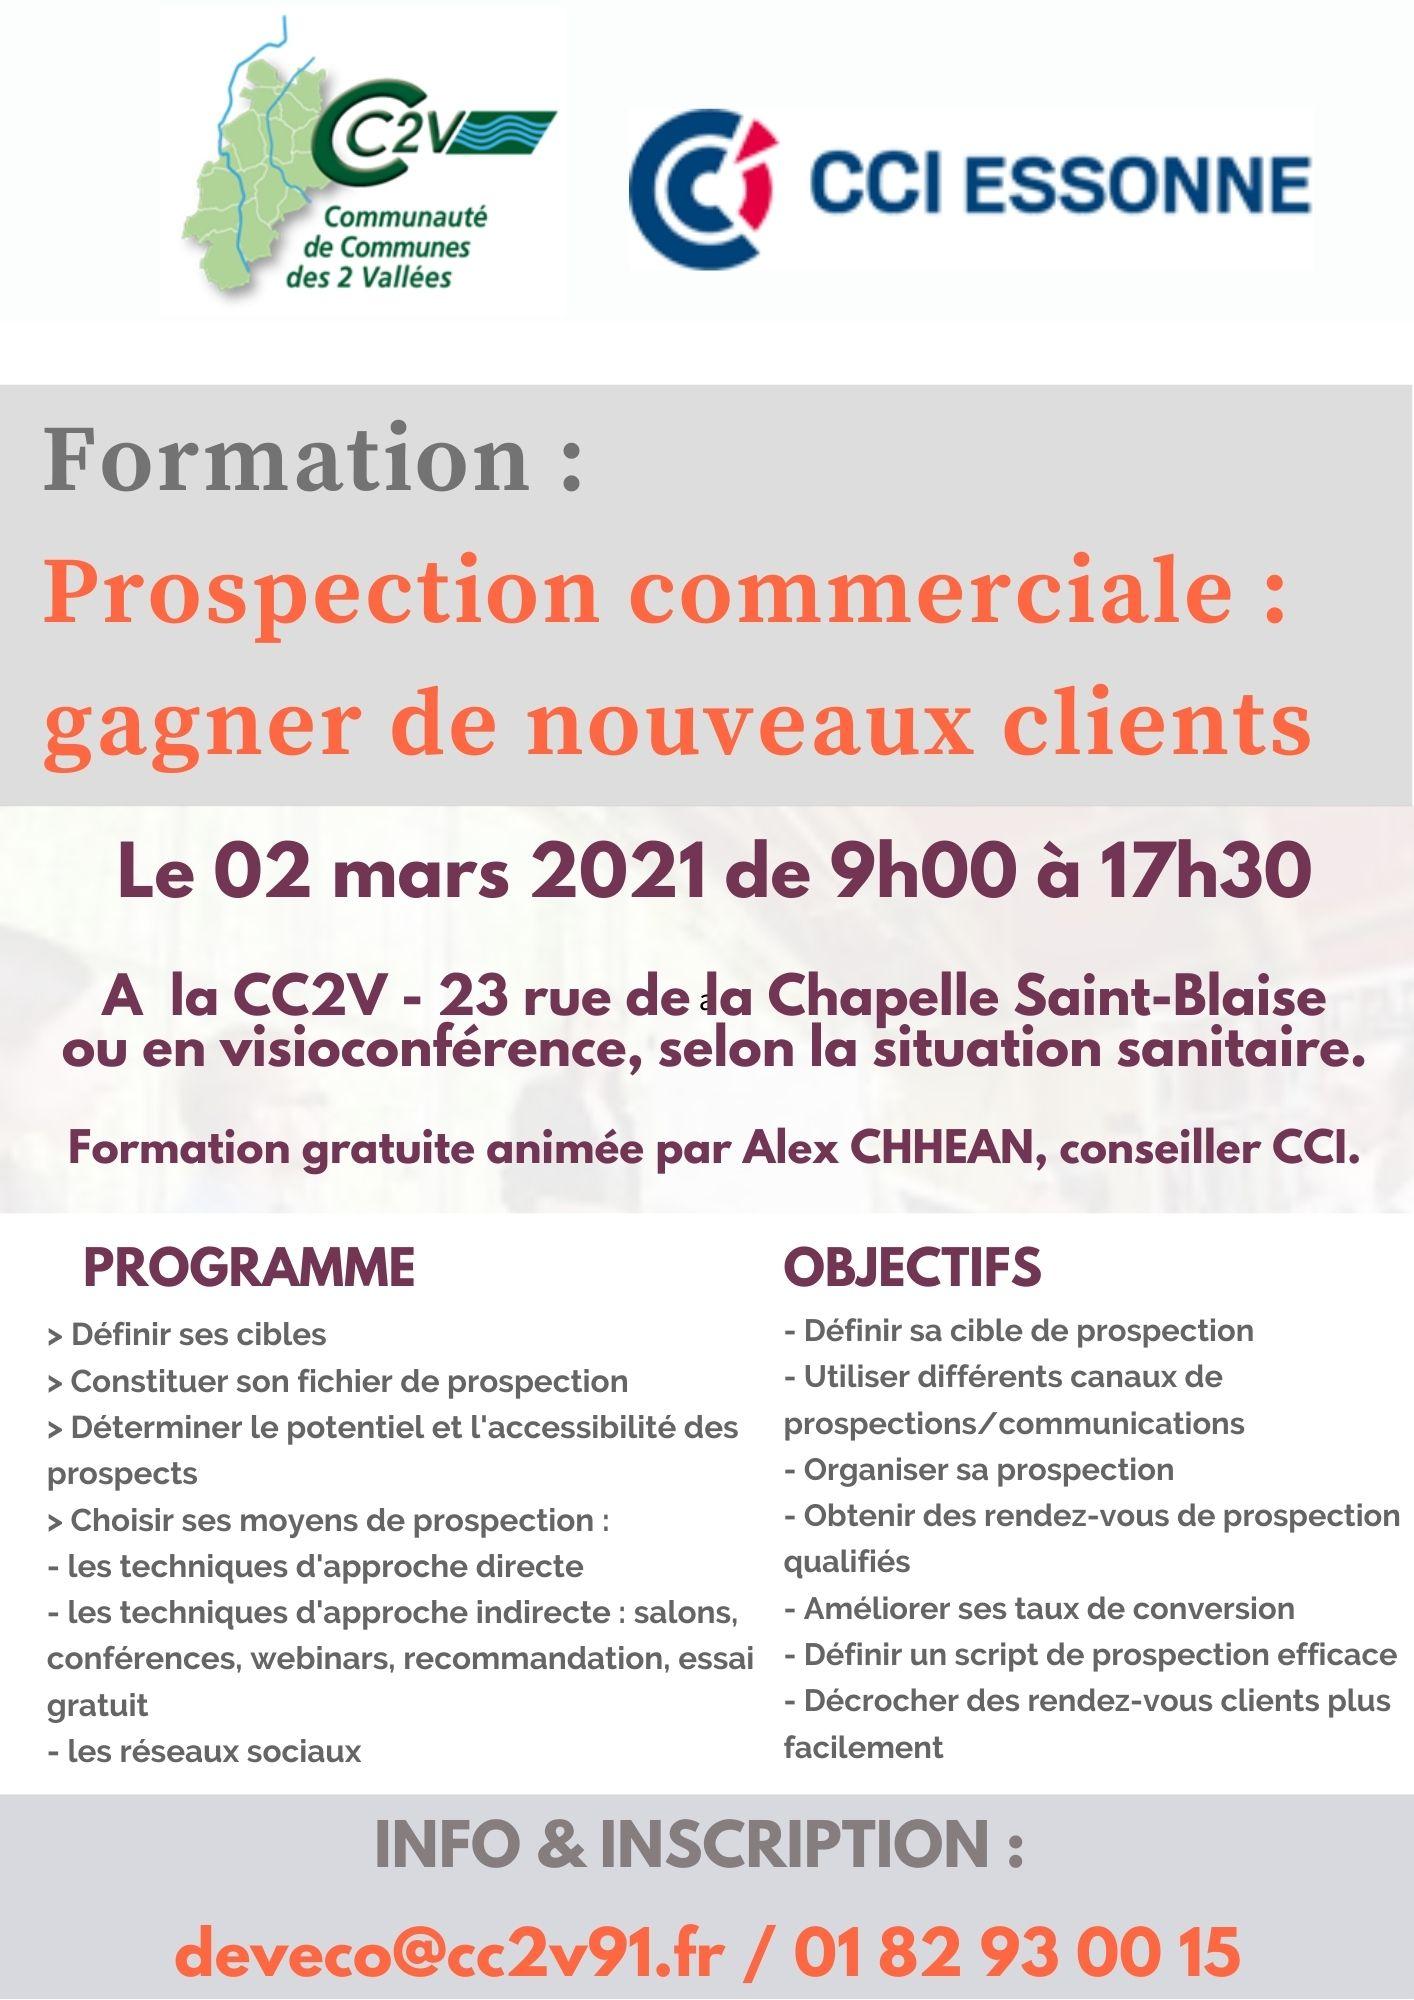 CC2V_Visuel Formation Prospection commerciale_02 03 2021.jpg